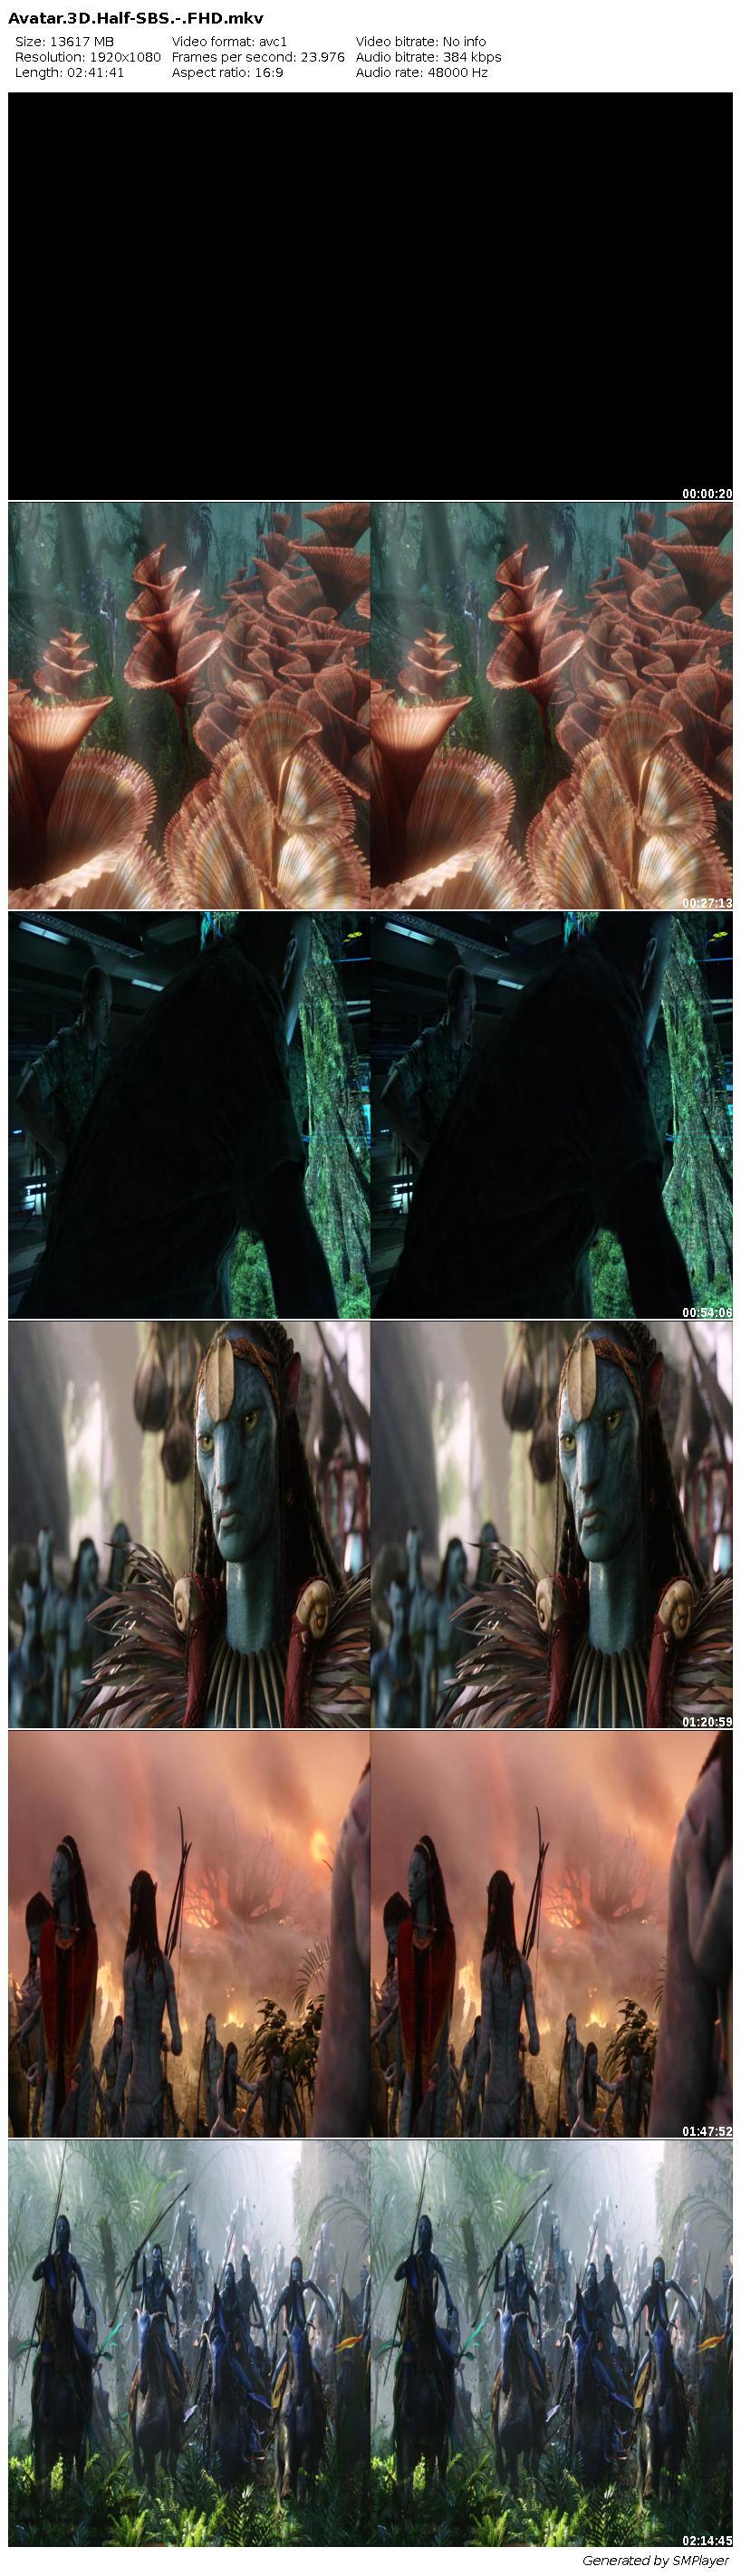 Avatar 3D / Avatar 3D (2009)